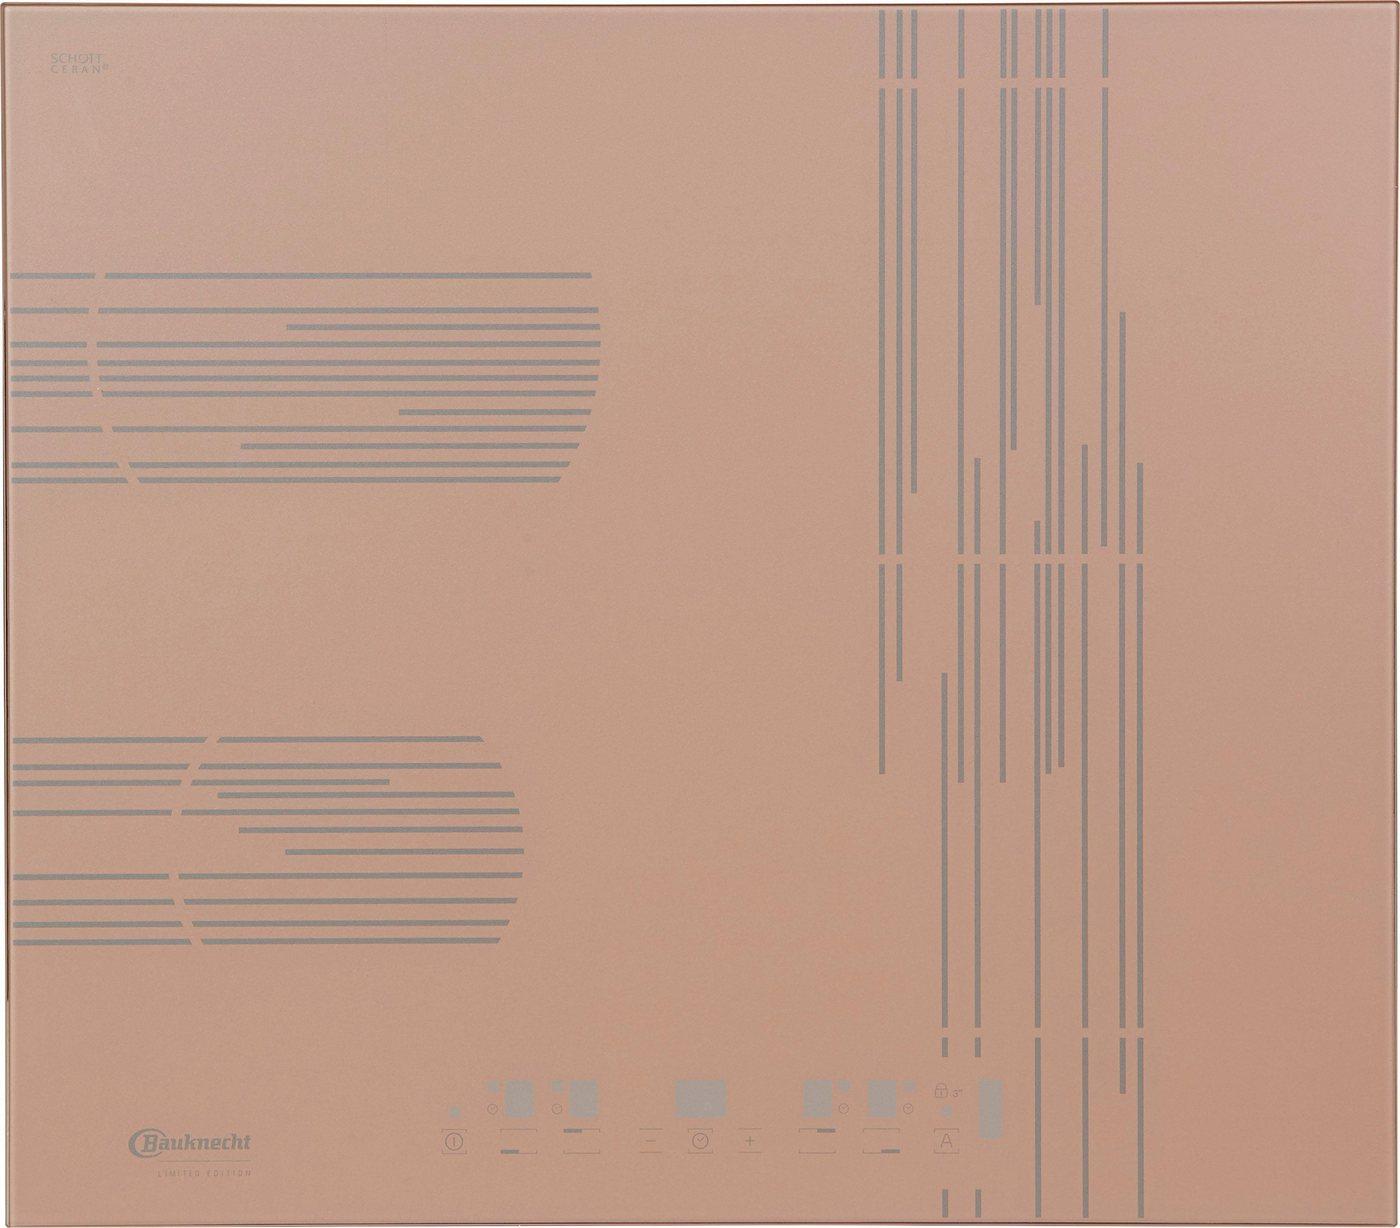 BAUKNECHT Induktions-Kochfeld ESDF 6040 FS, Limited Edition - BAUKNECHT